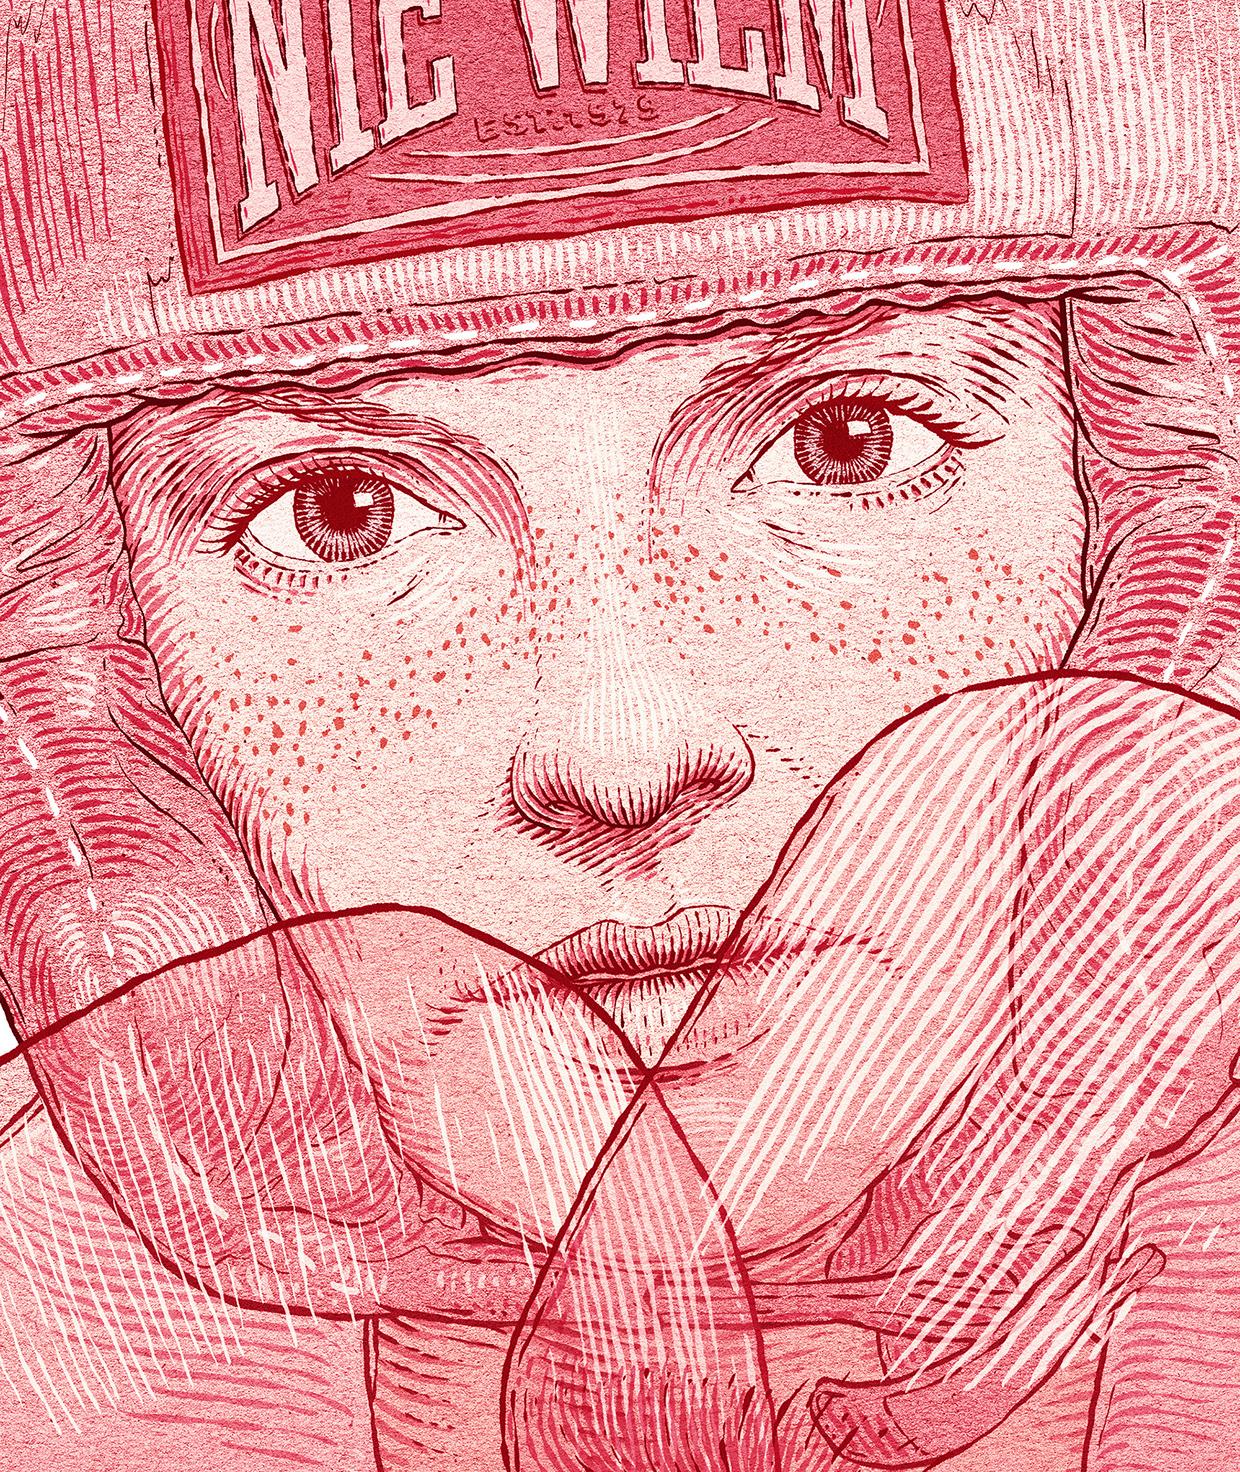 Incríveis ilustrações de BartoszKosowski